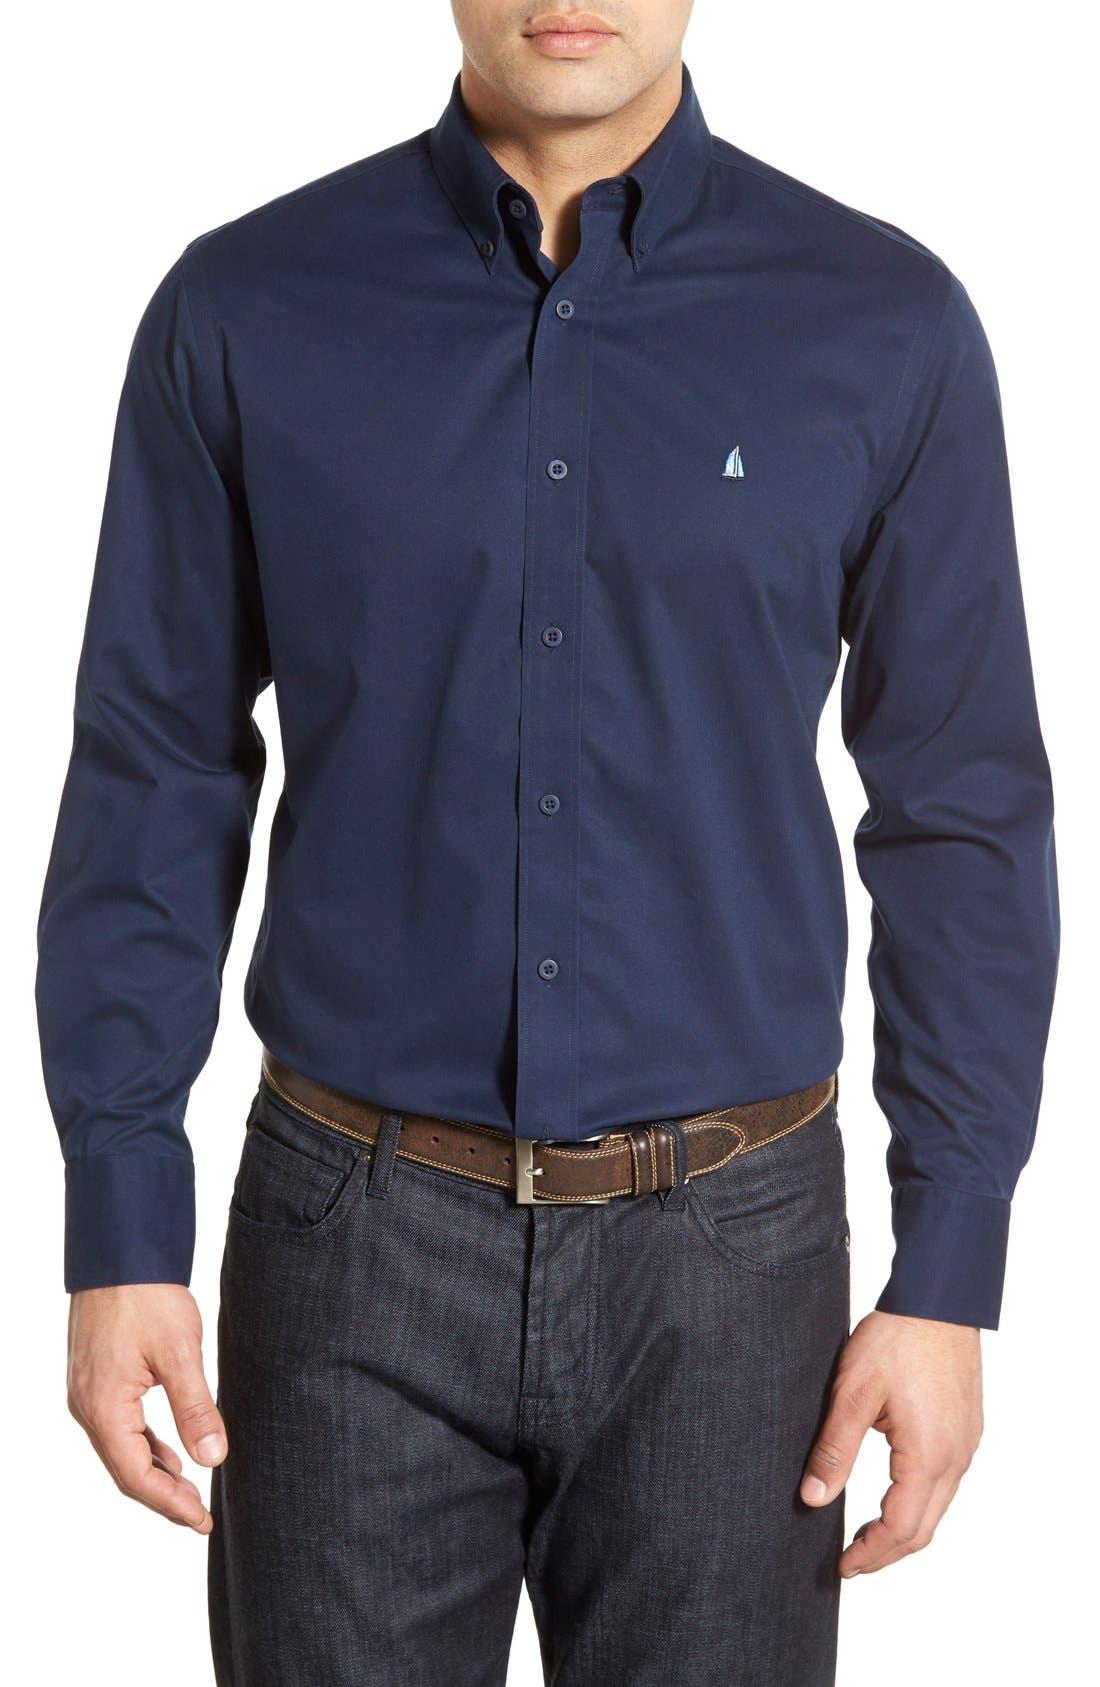 Alternate Image 1 Selected - Nordstrom Men's Shop Smartcare™ Traditional Fit Twill Boat Shirt (Regular & Tall)